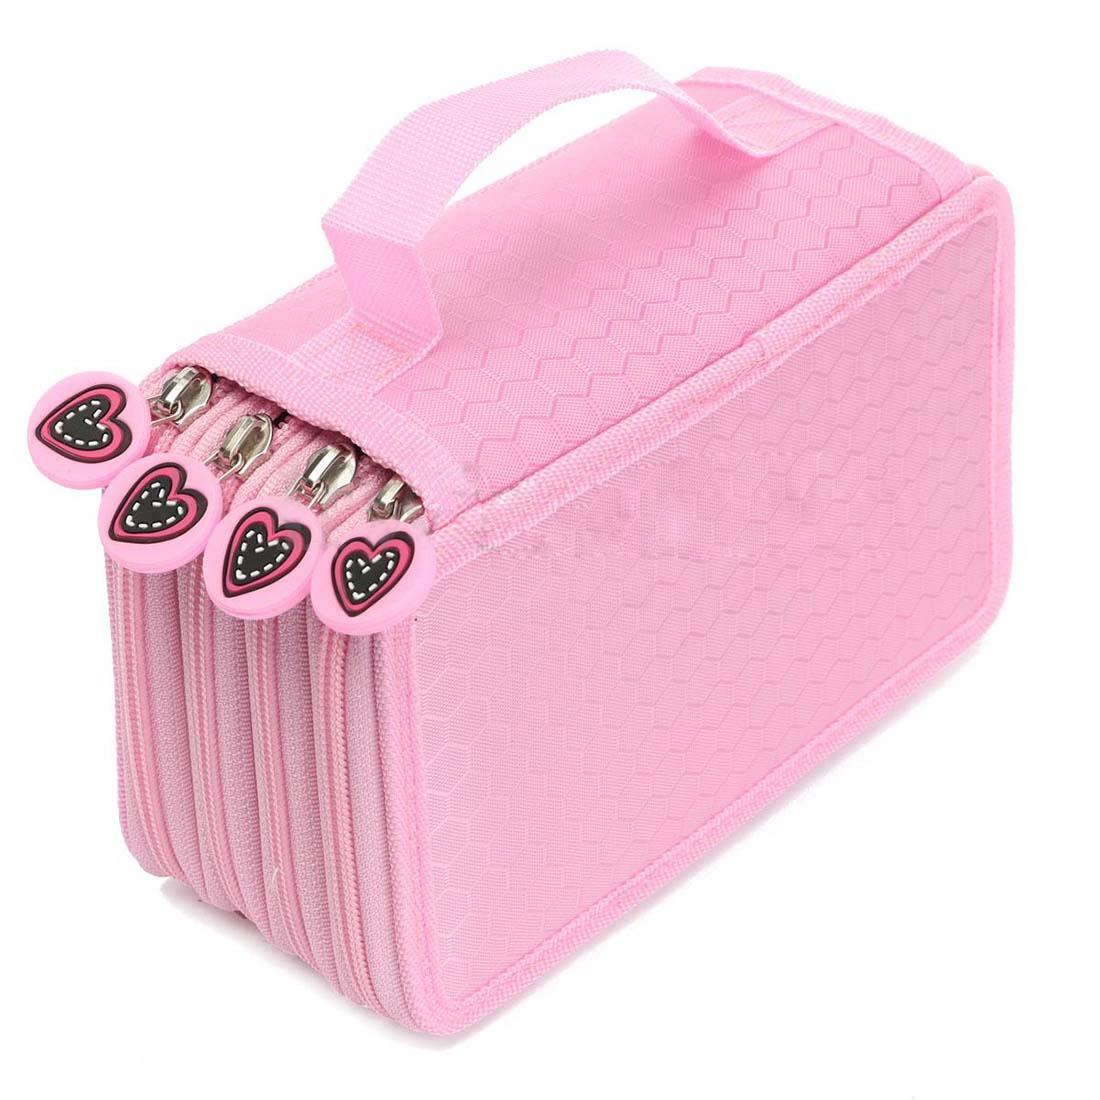 Pencil Bags cases Pencil box boxes A pencil case Pink School & Office pencil bags pencil cases pencil box rose red